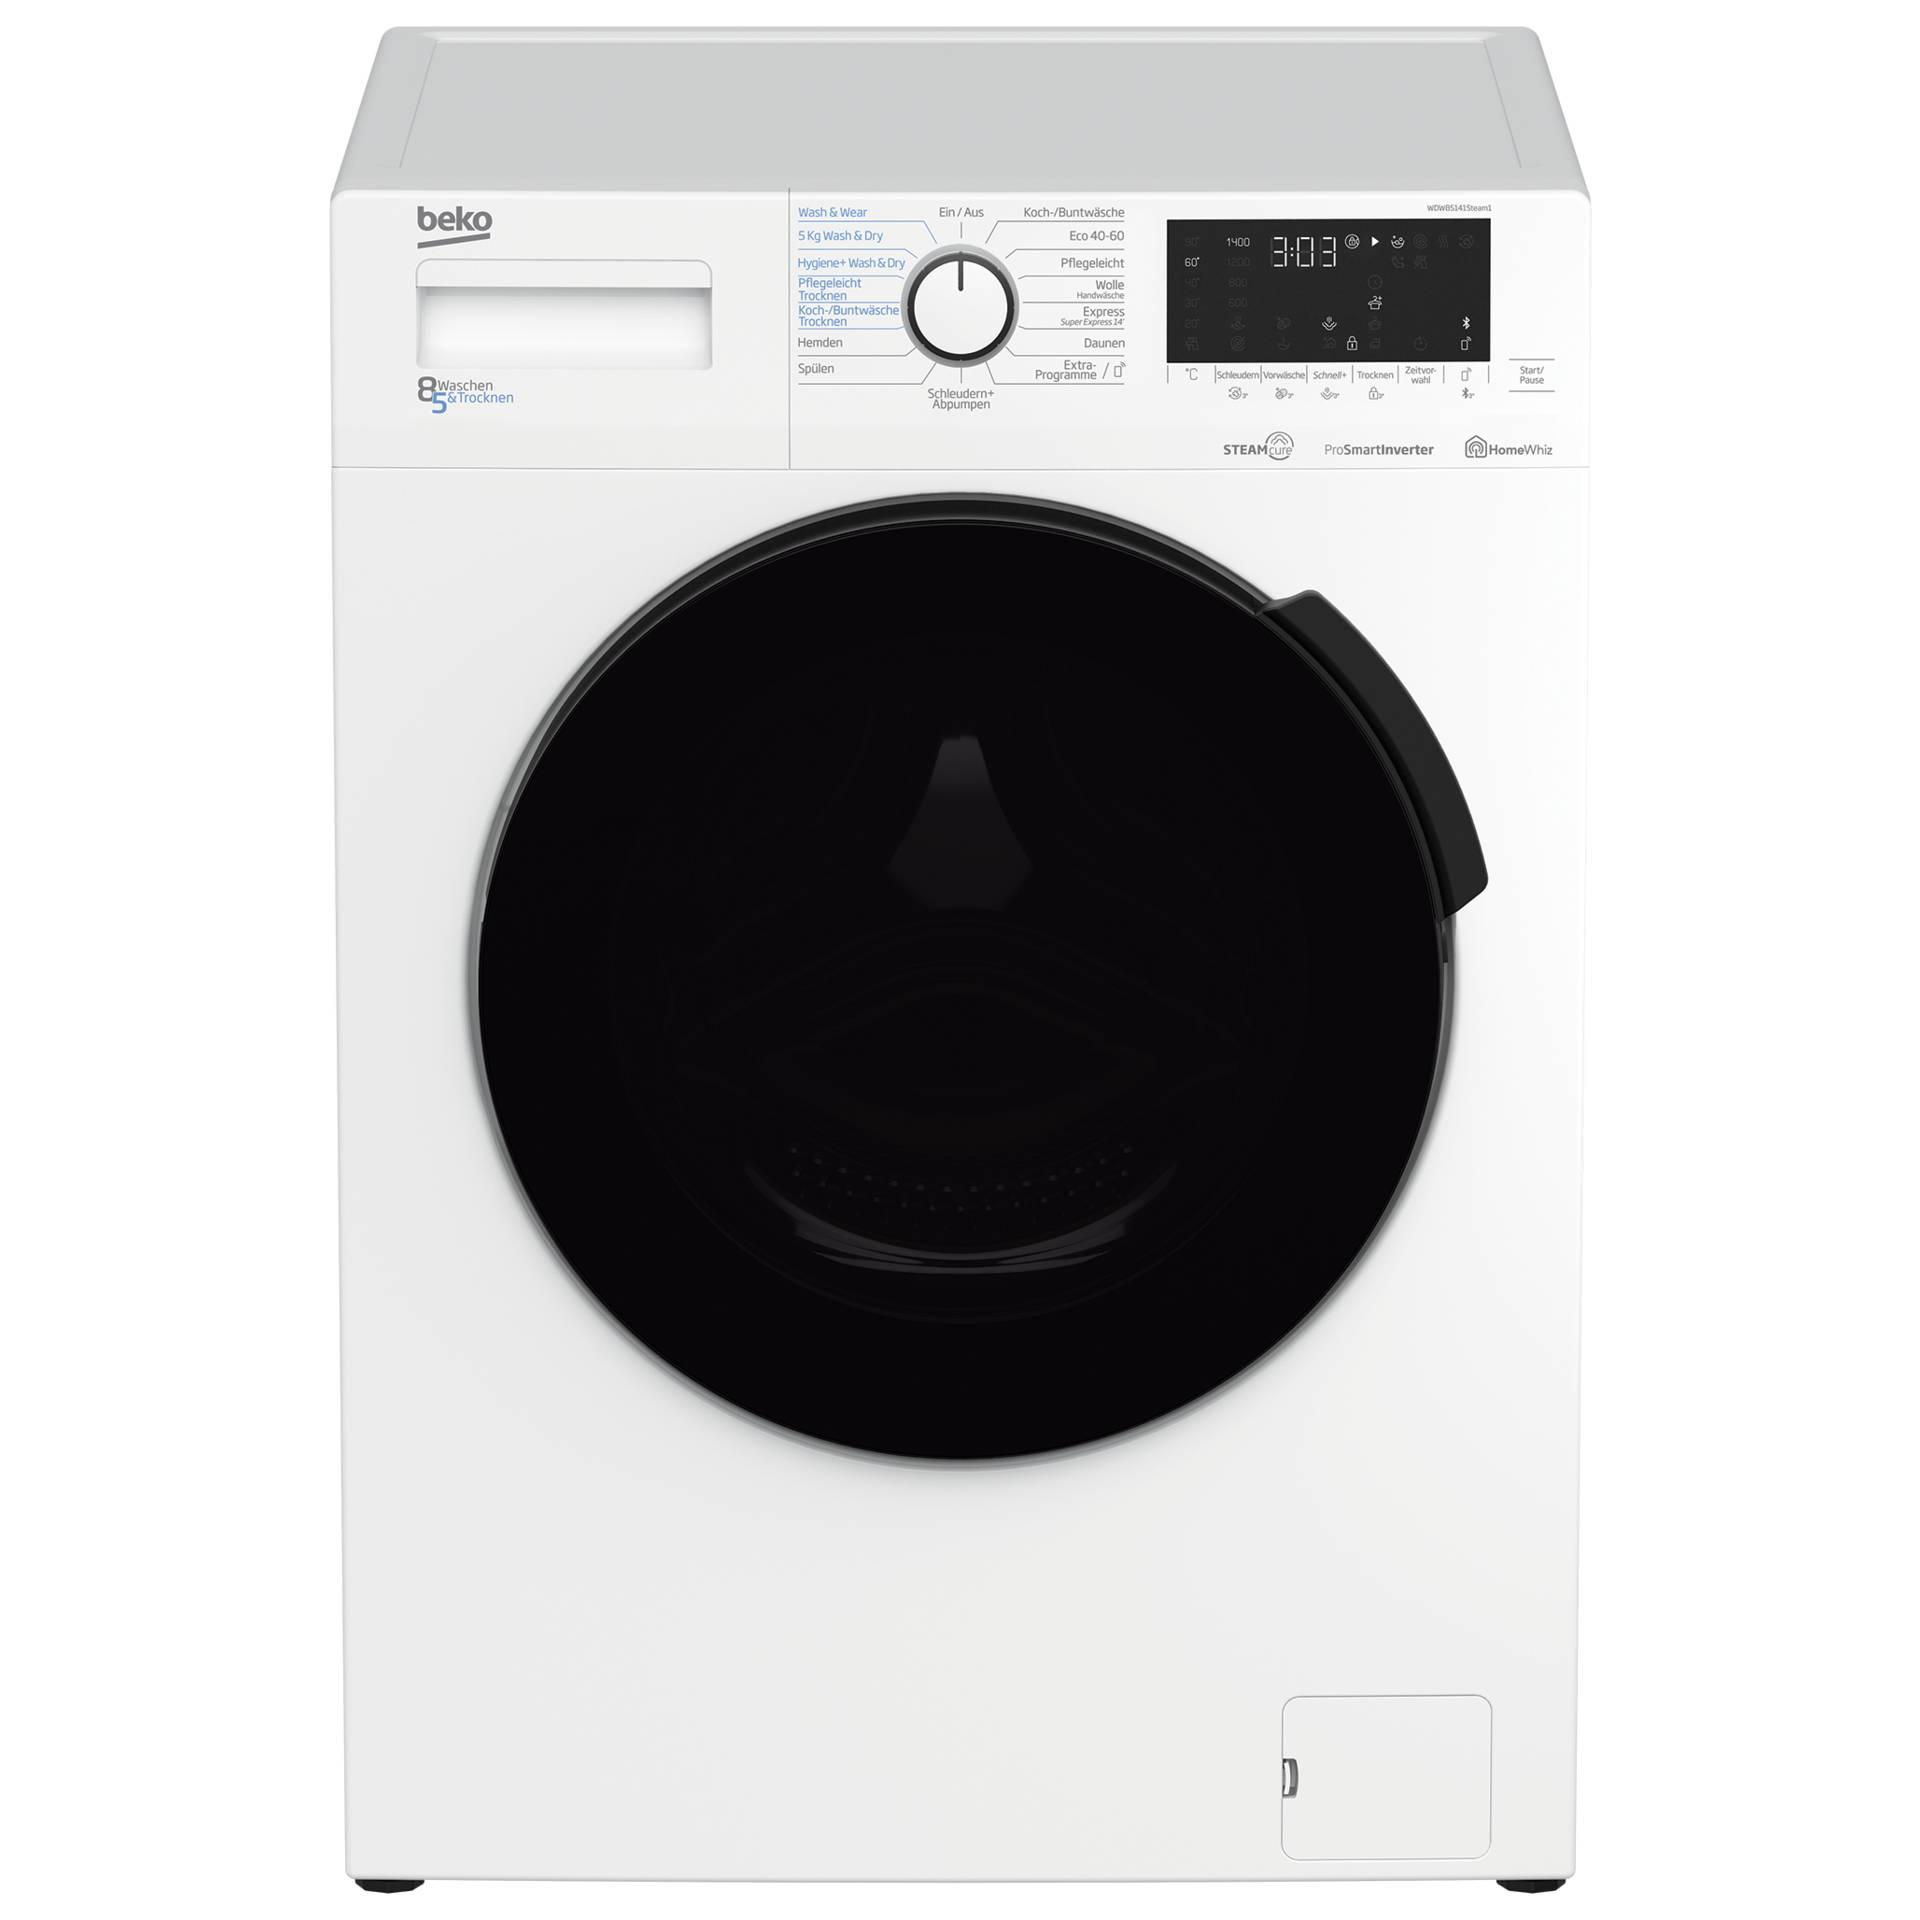 Beko WDW 85141 Steam 1